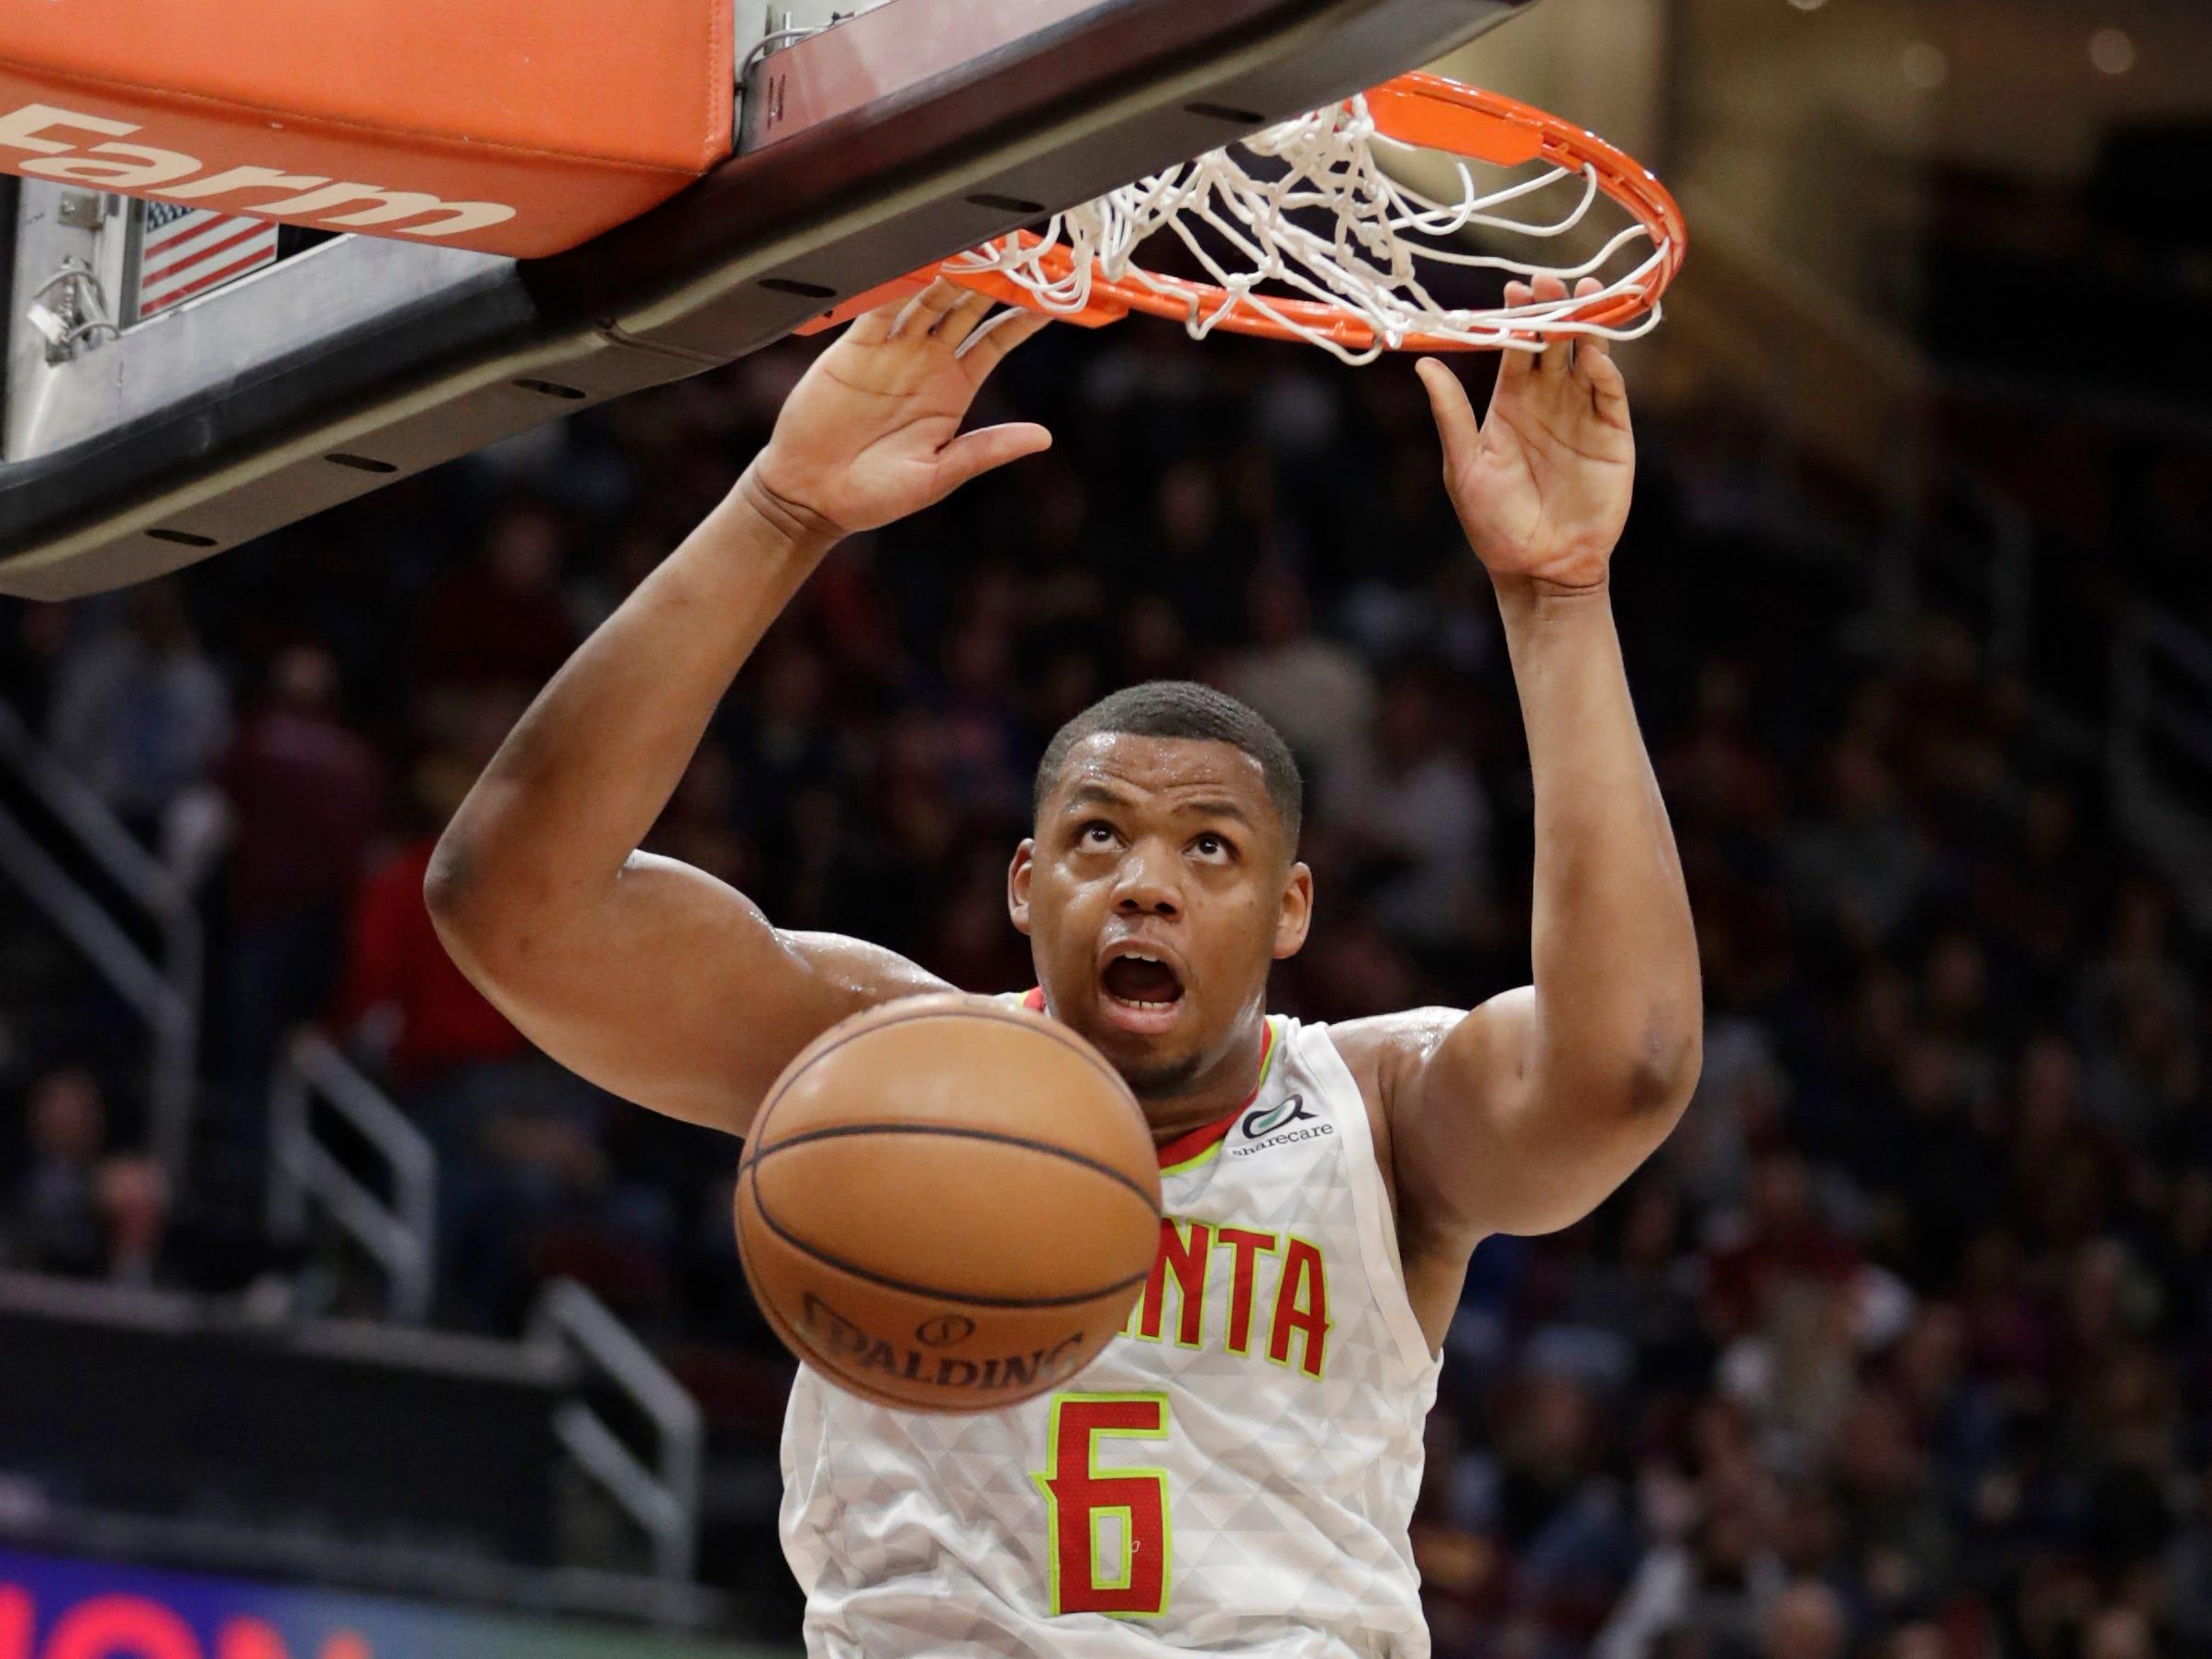 Oct. 21: An unguarded Omari Spellman slams down a dunk for the Hawks against the Cavaliers.